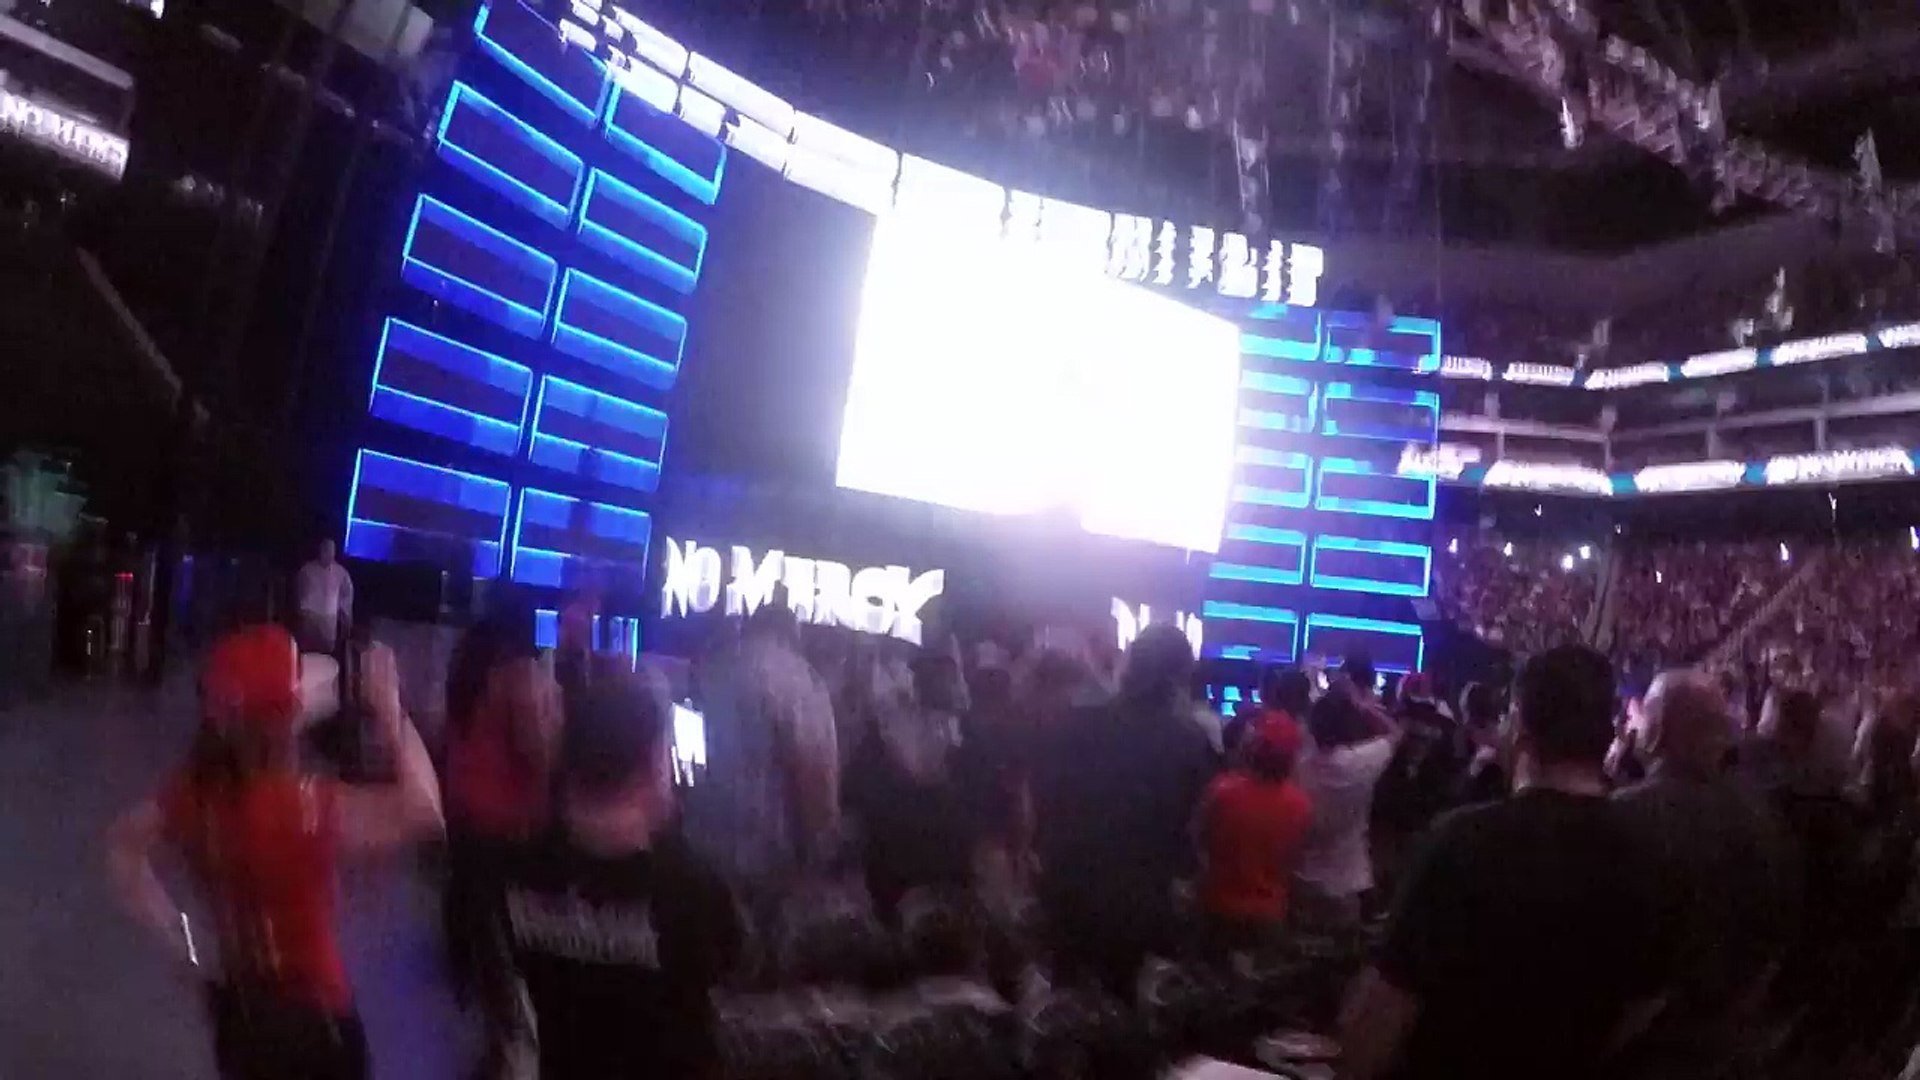 WWE No Mercy 2016 Intro and pyro (live near entrance ramp)